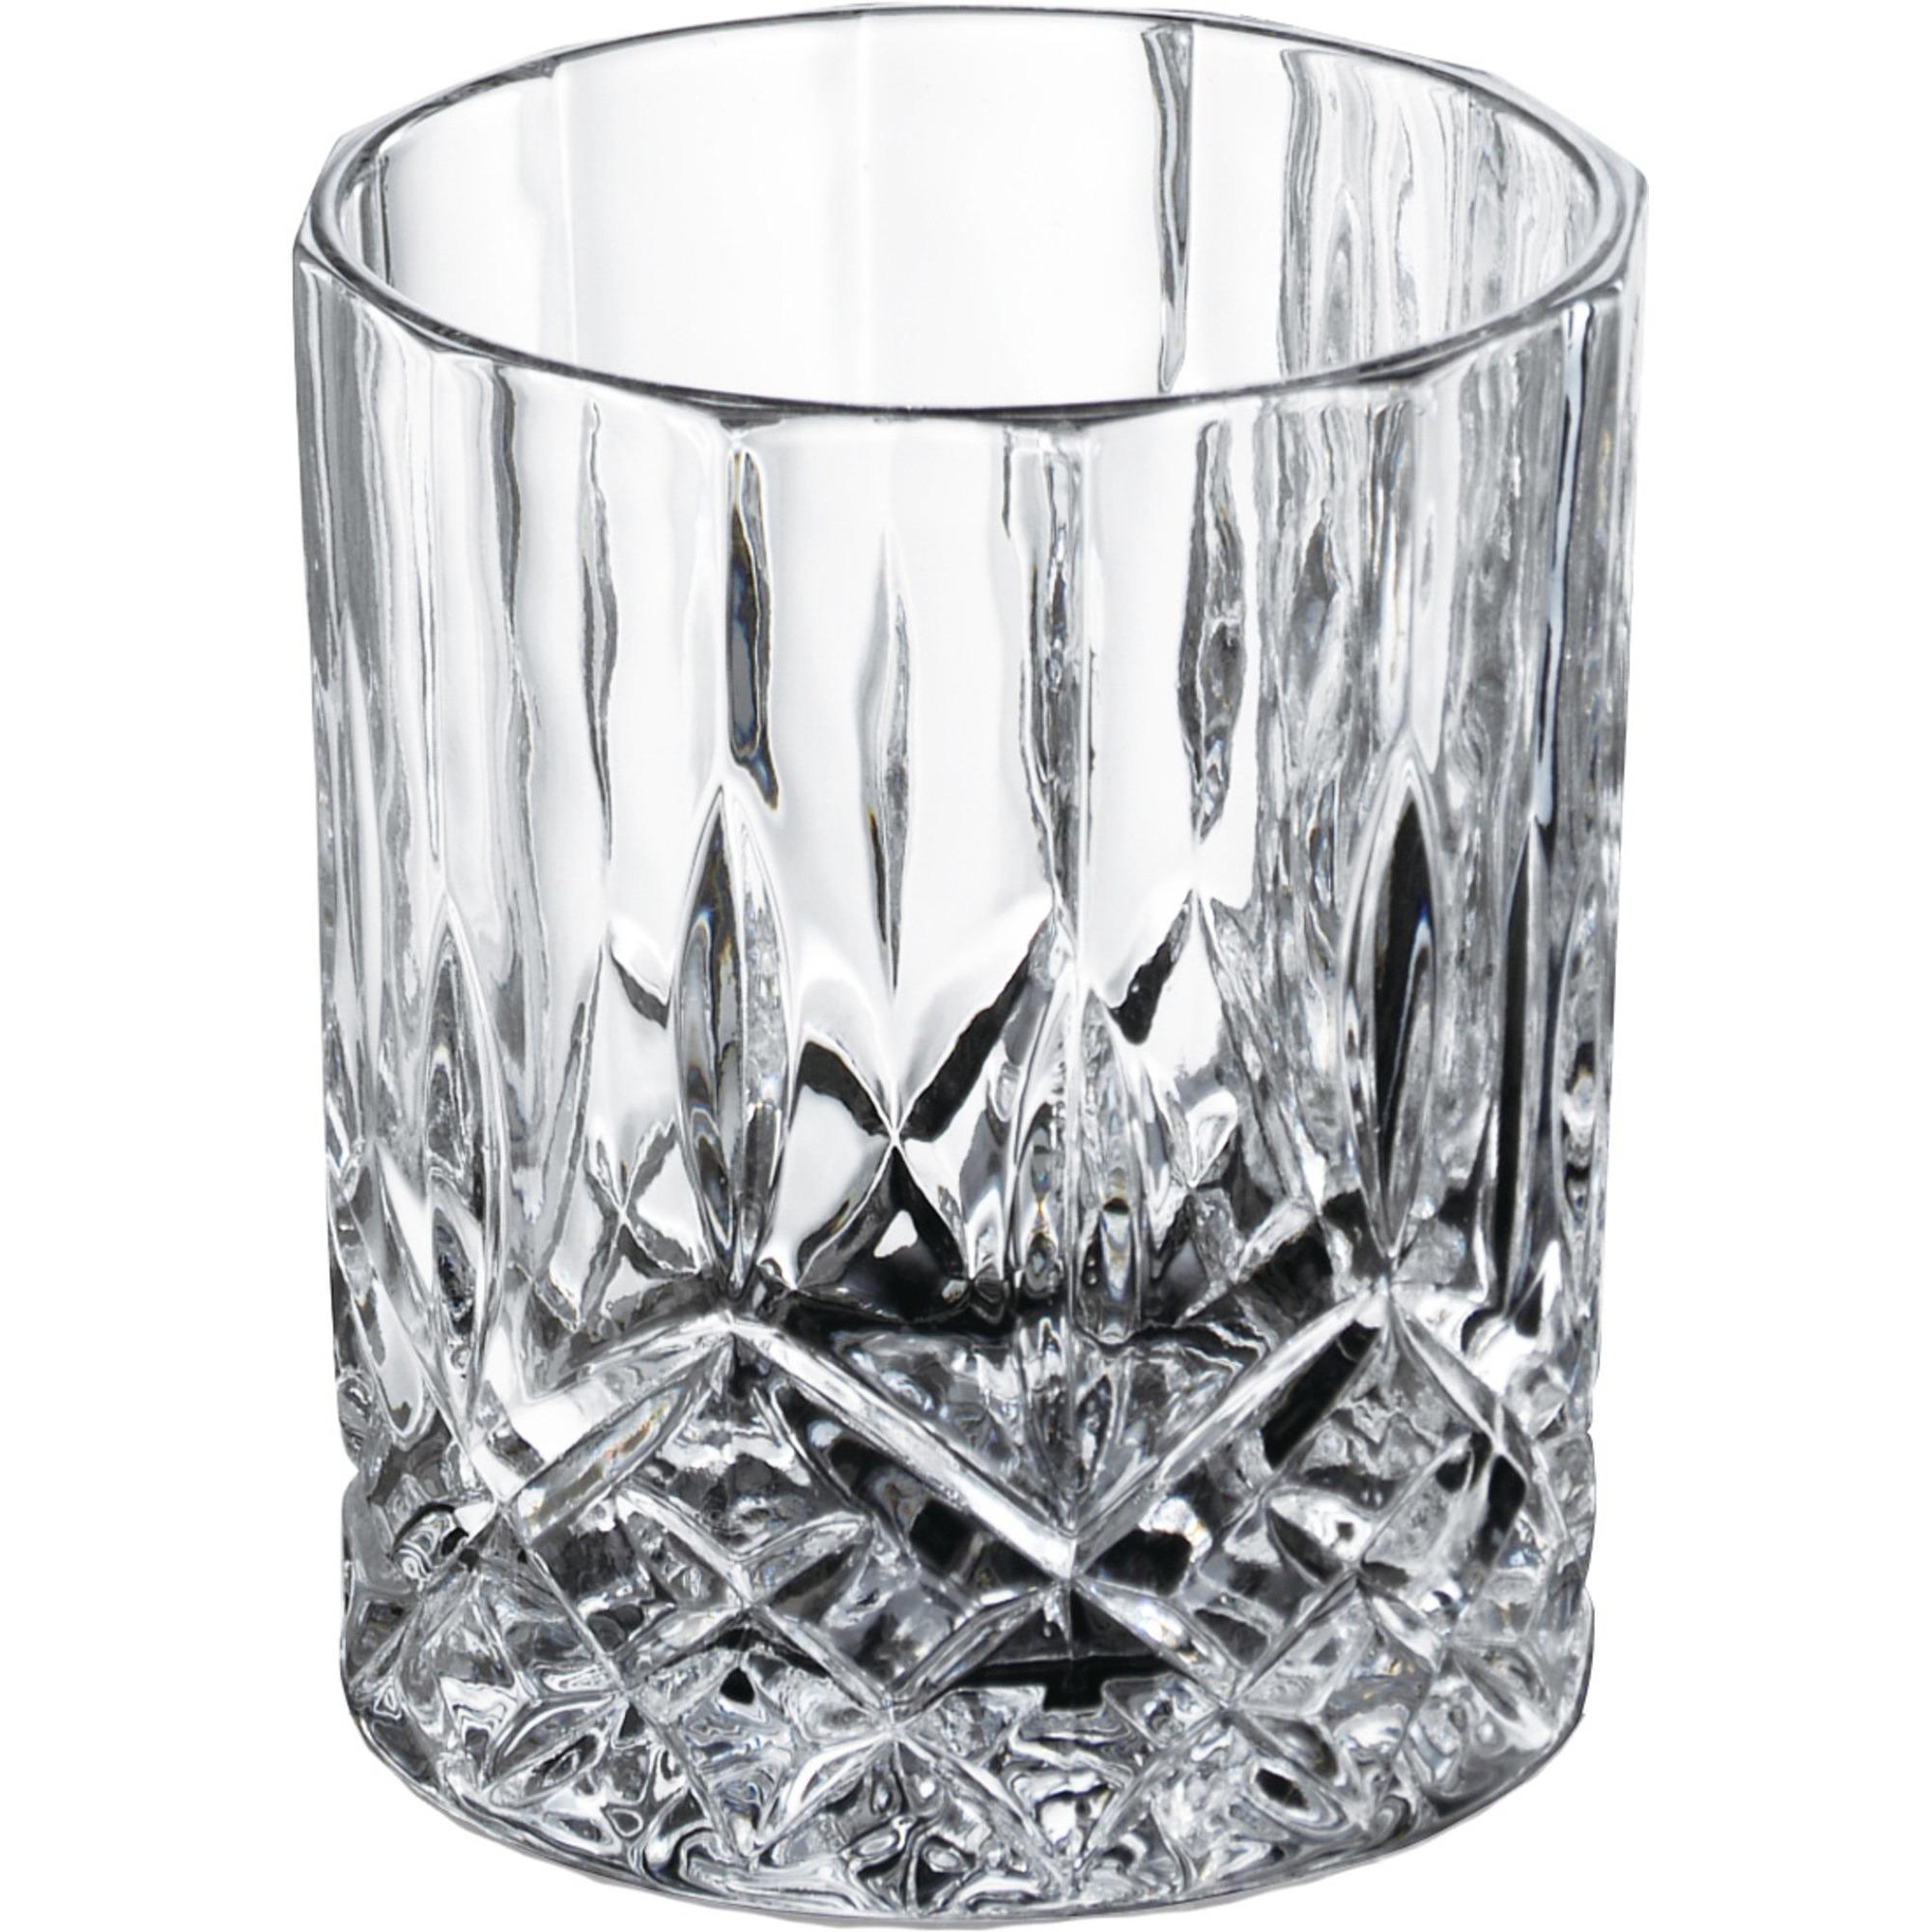 Aida Harvey Cocktailglas 24 cl Klar 4 st